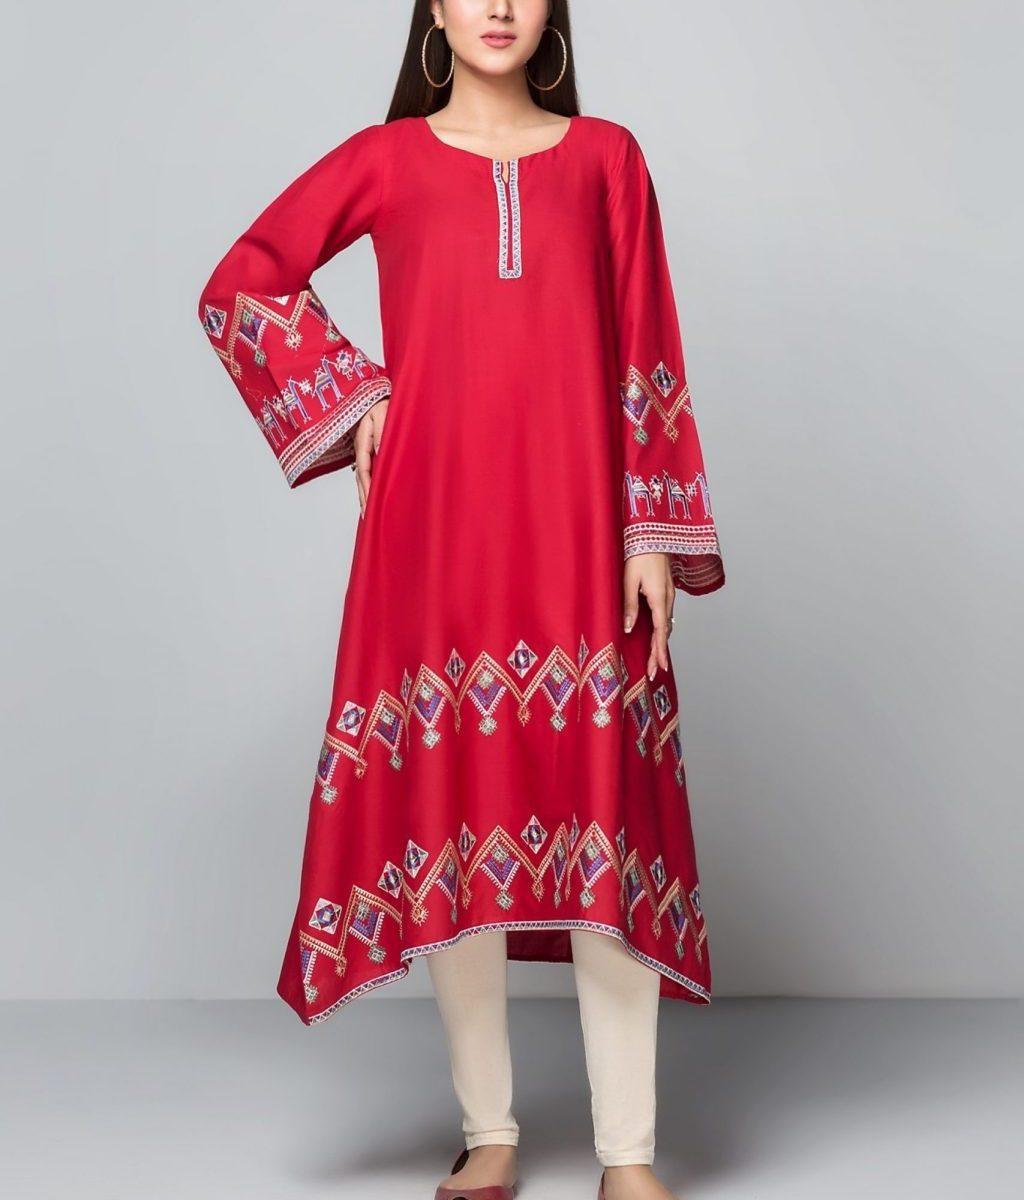 Origins Summer Sale On 10th Anniversary Flat 30% off Dresses 2020